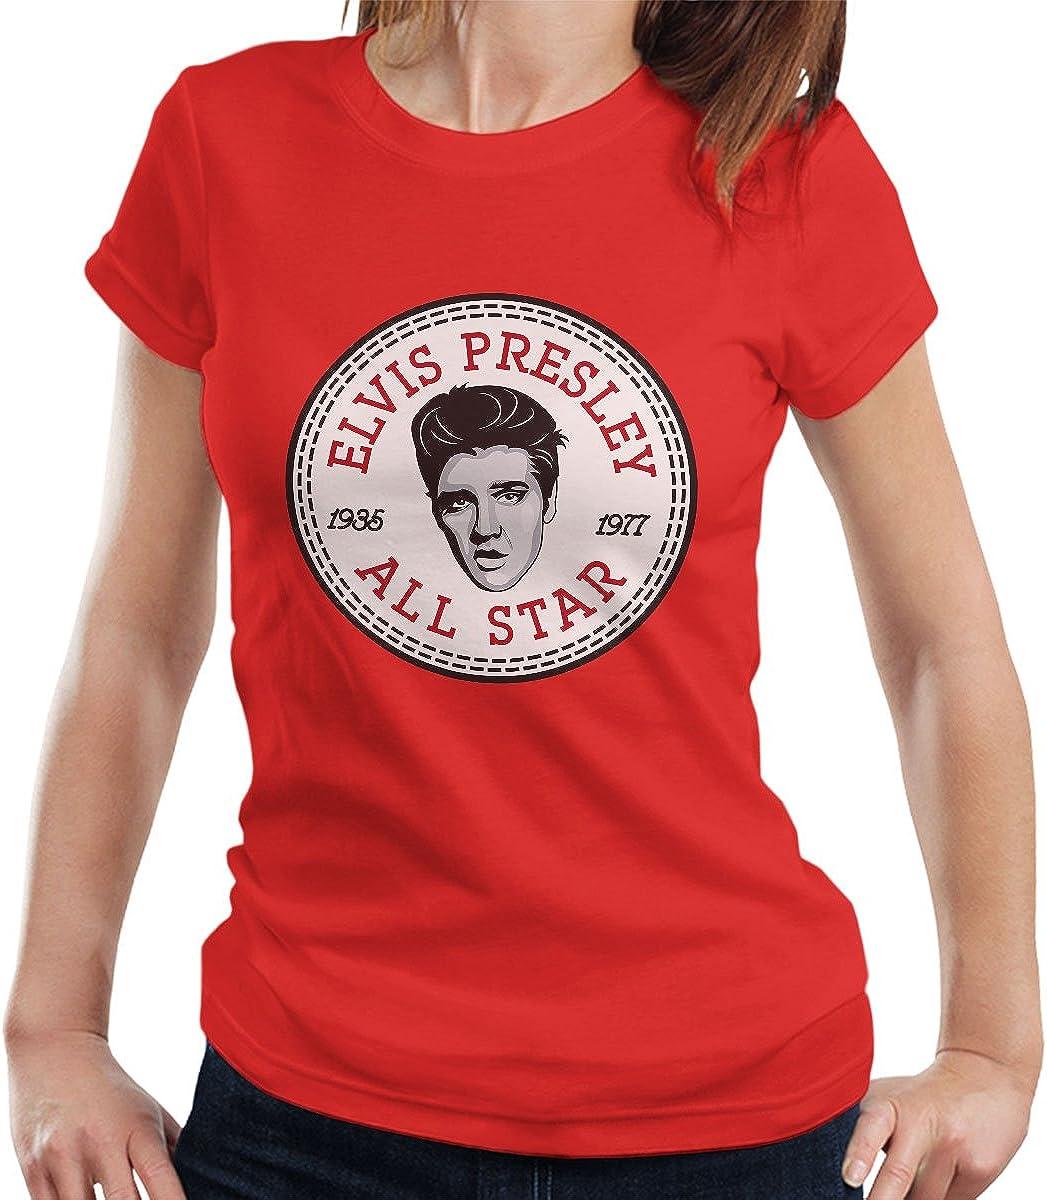 Elvis Presley All Star Converse Logo Women's T Shirt: Amazon